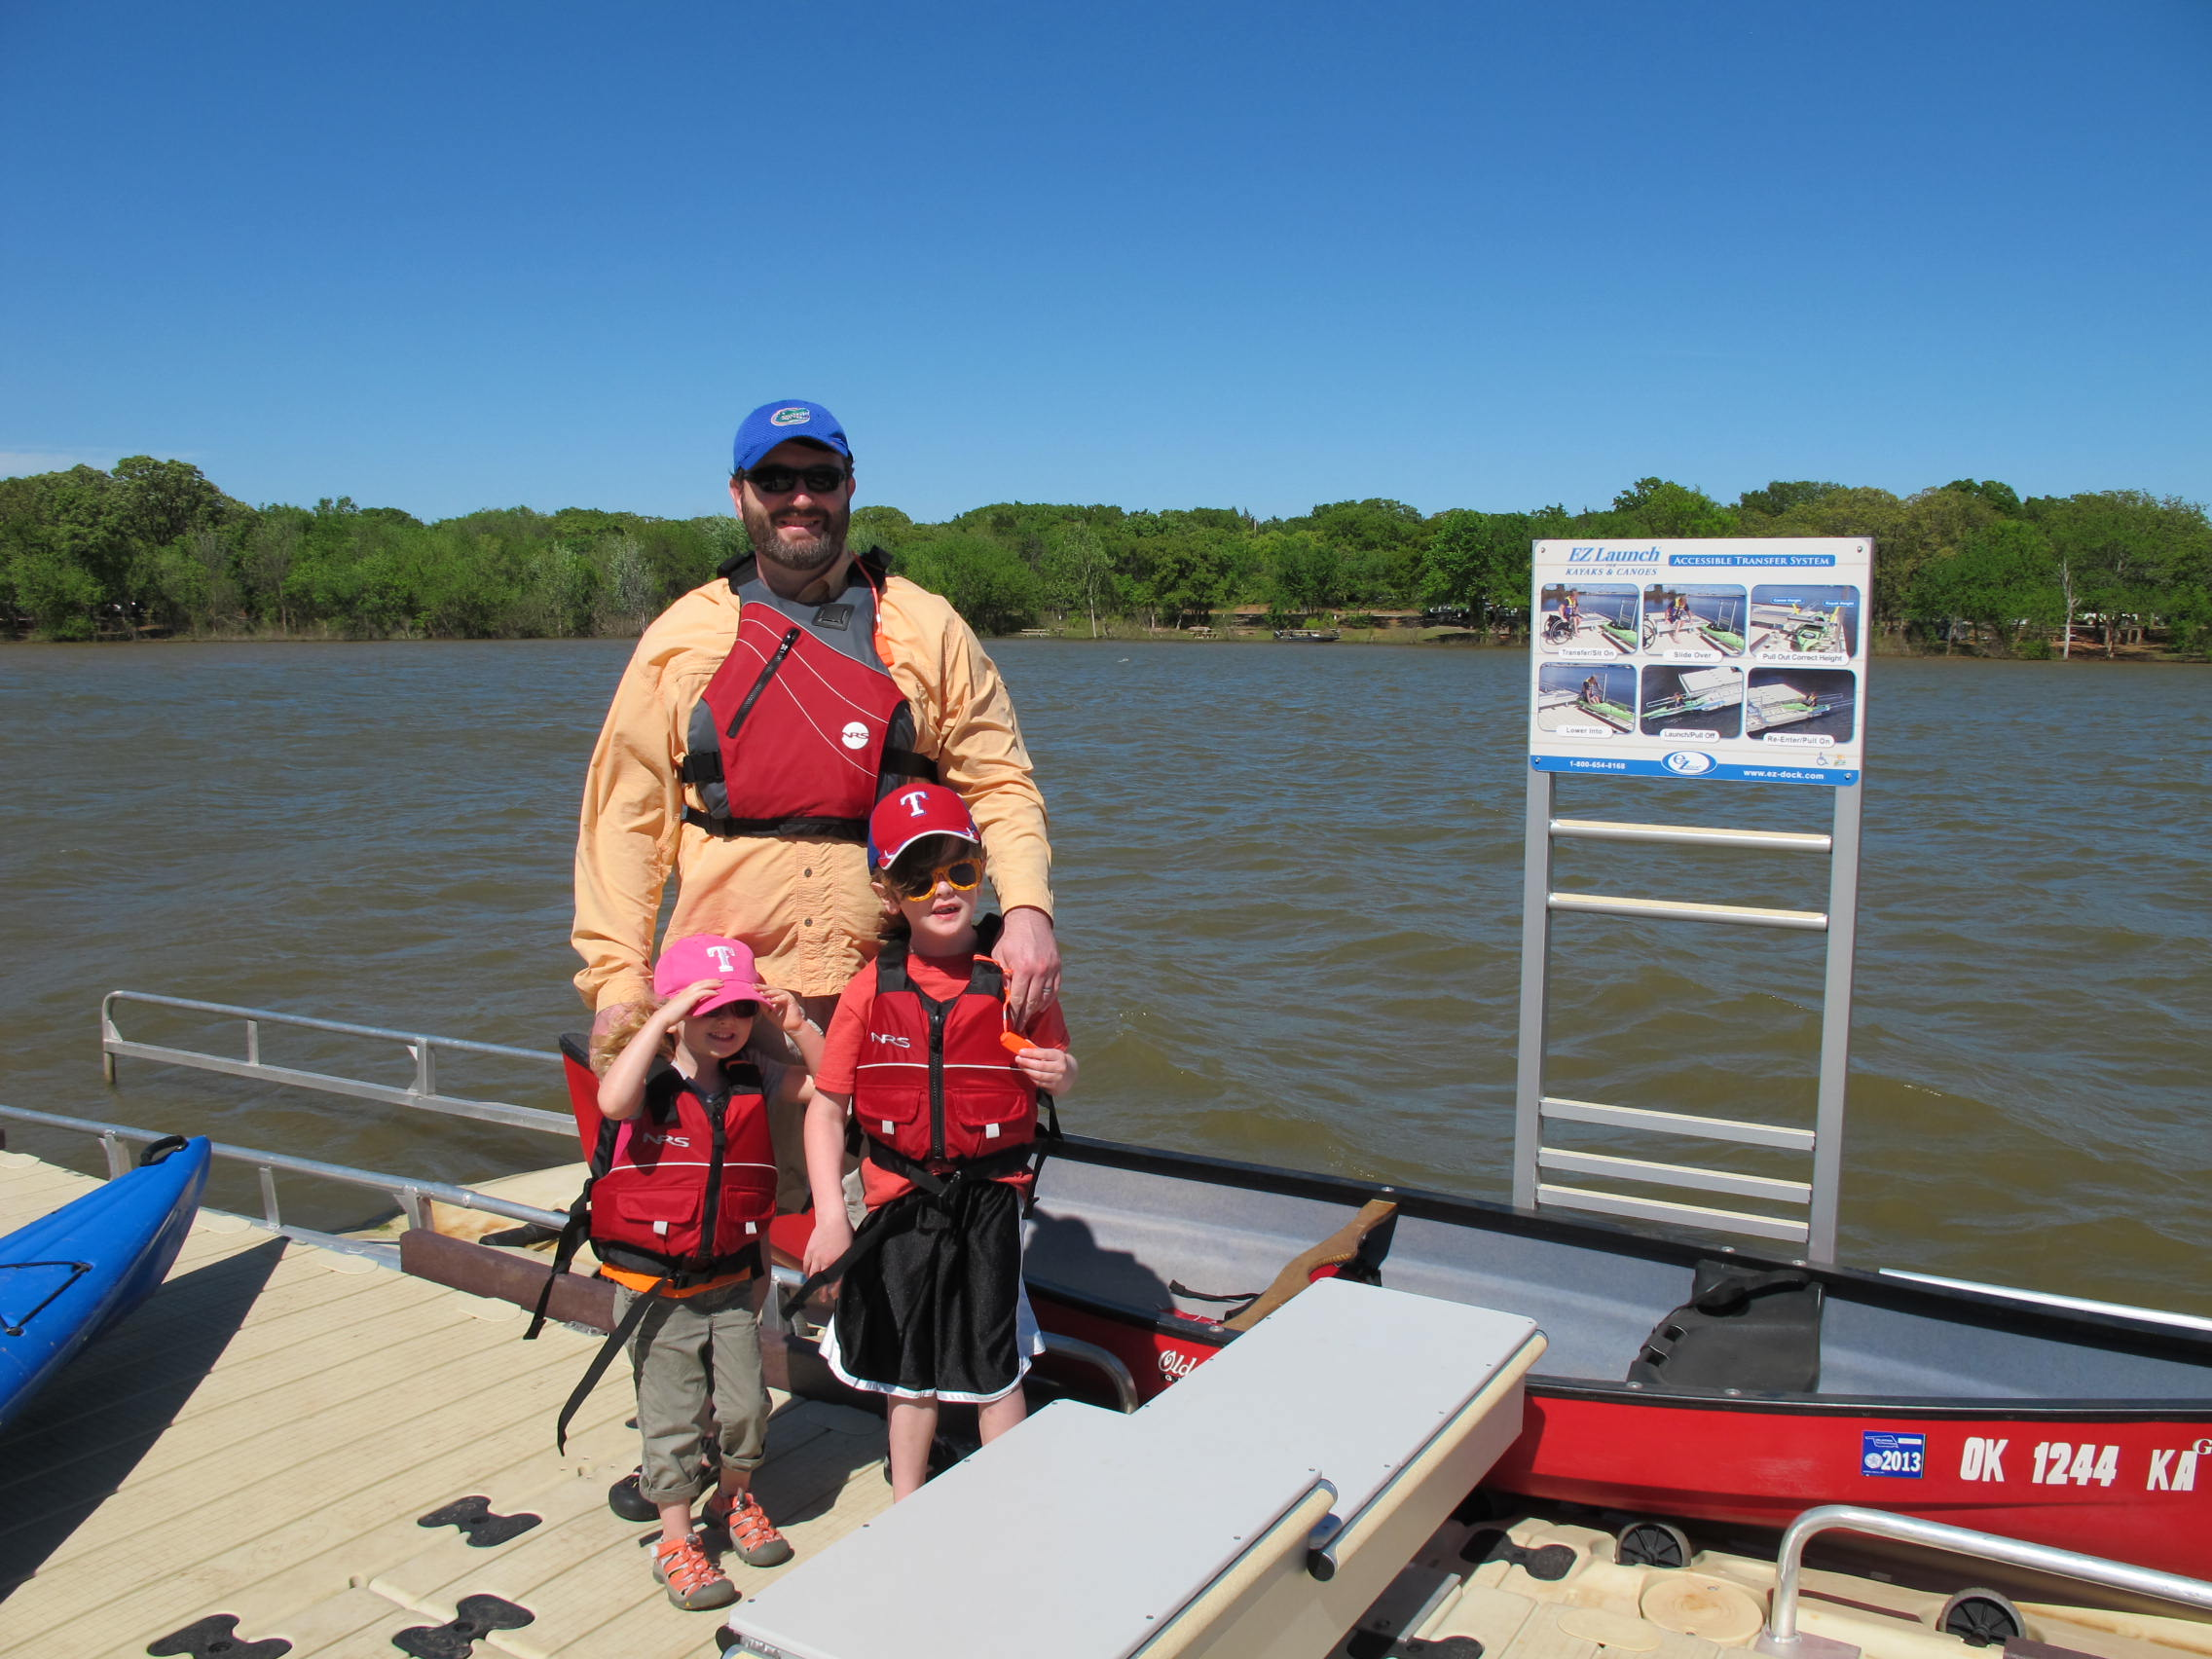 Canoeing with Kids in Oklahoma - MetroFamily Magazine